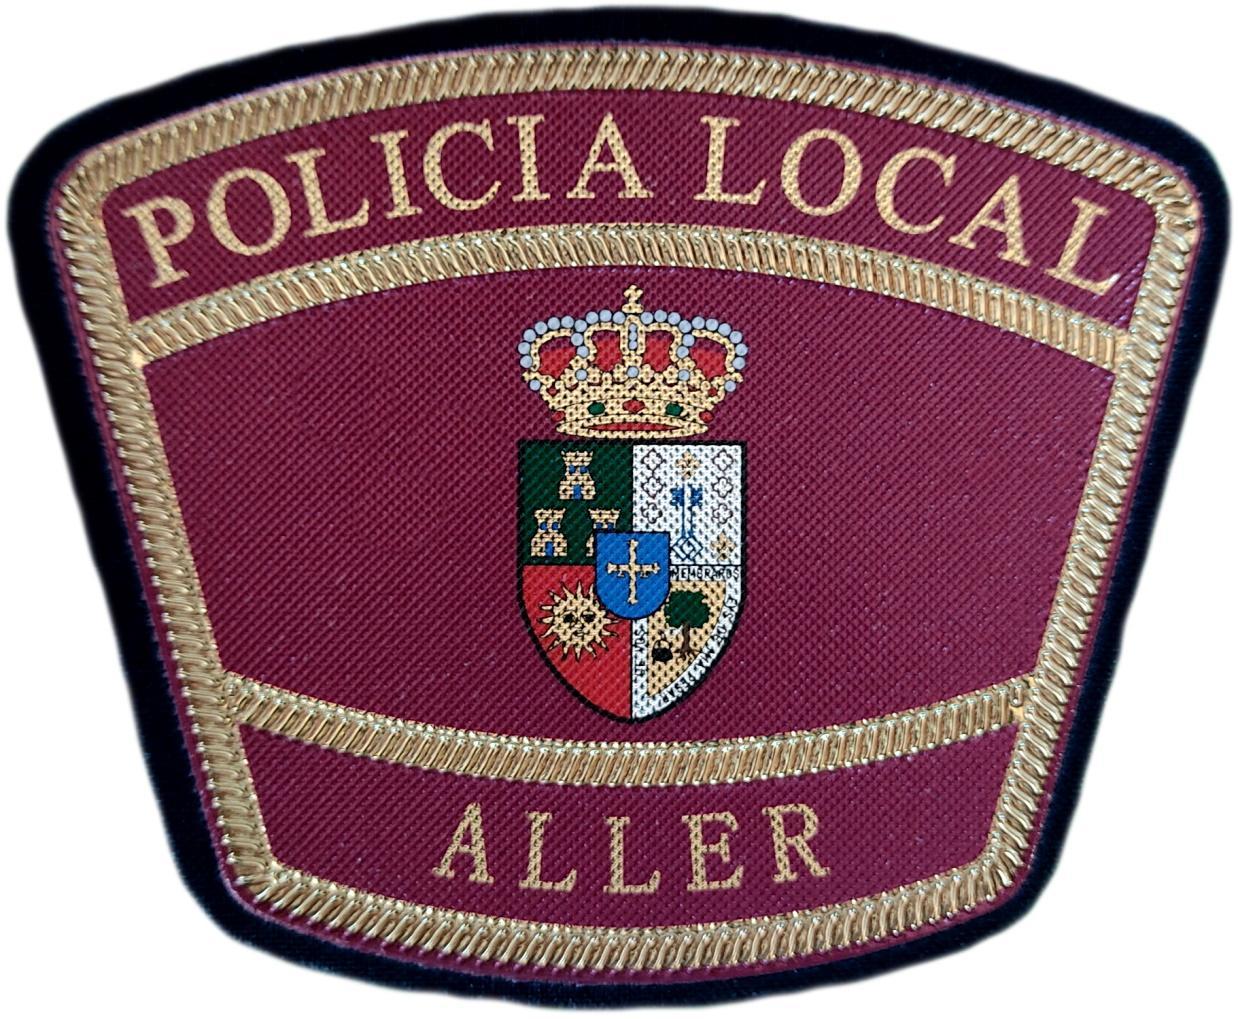 Policía Local Aller Asturias parche insignia emblema distintivo